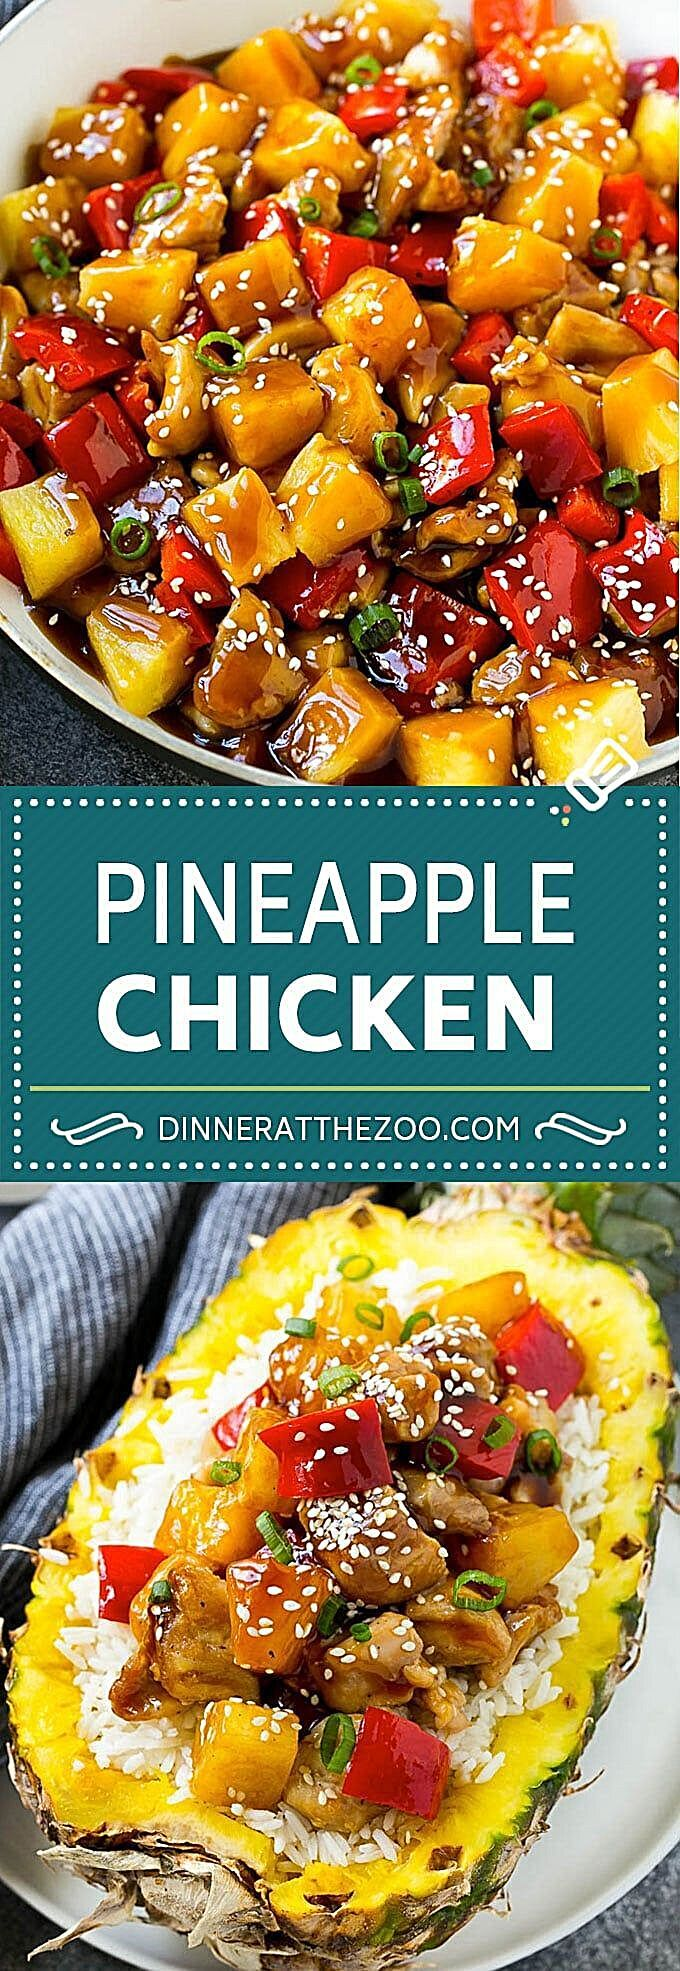 Pineapple Chicken  Hawaiian Chicken  Chicken Stir Fry  Pineapple Chicken  Hawaiian Chicken  Chicken Stir Fry